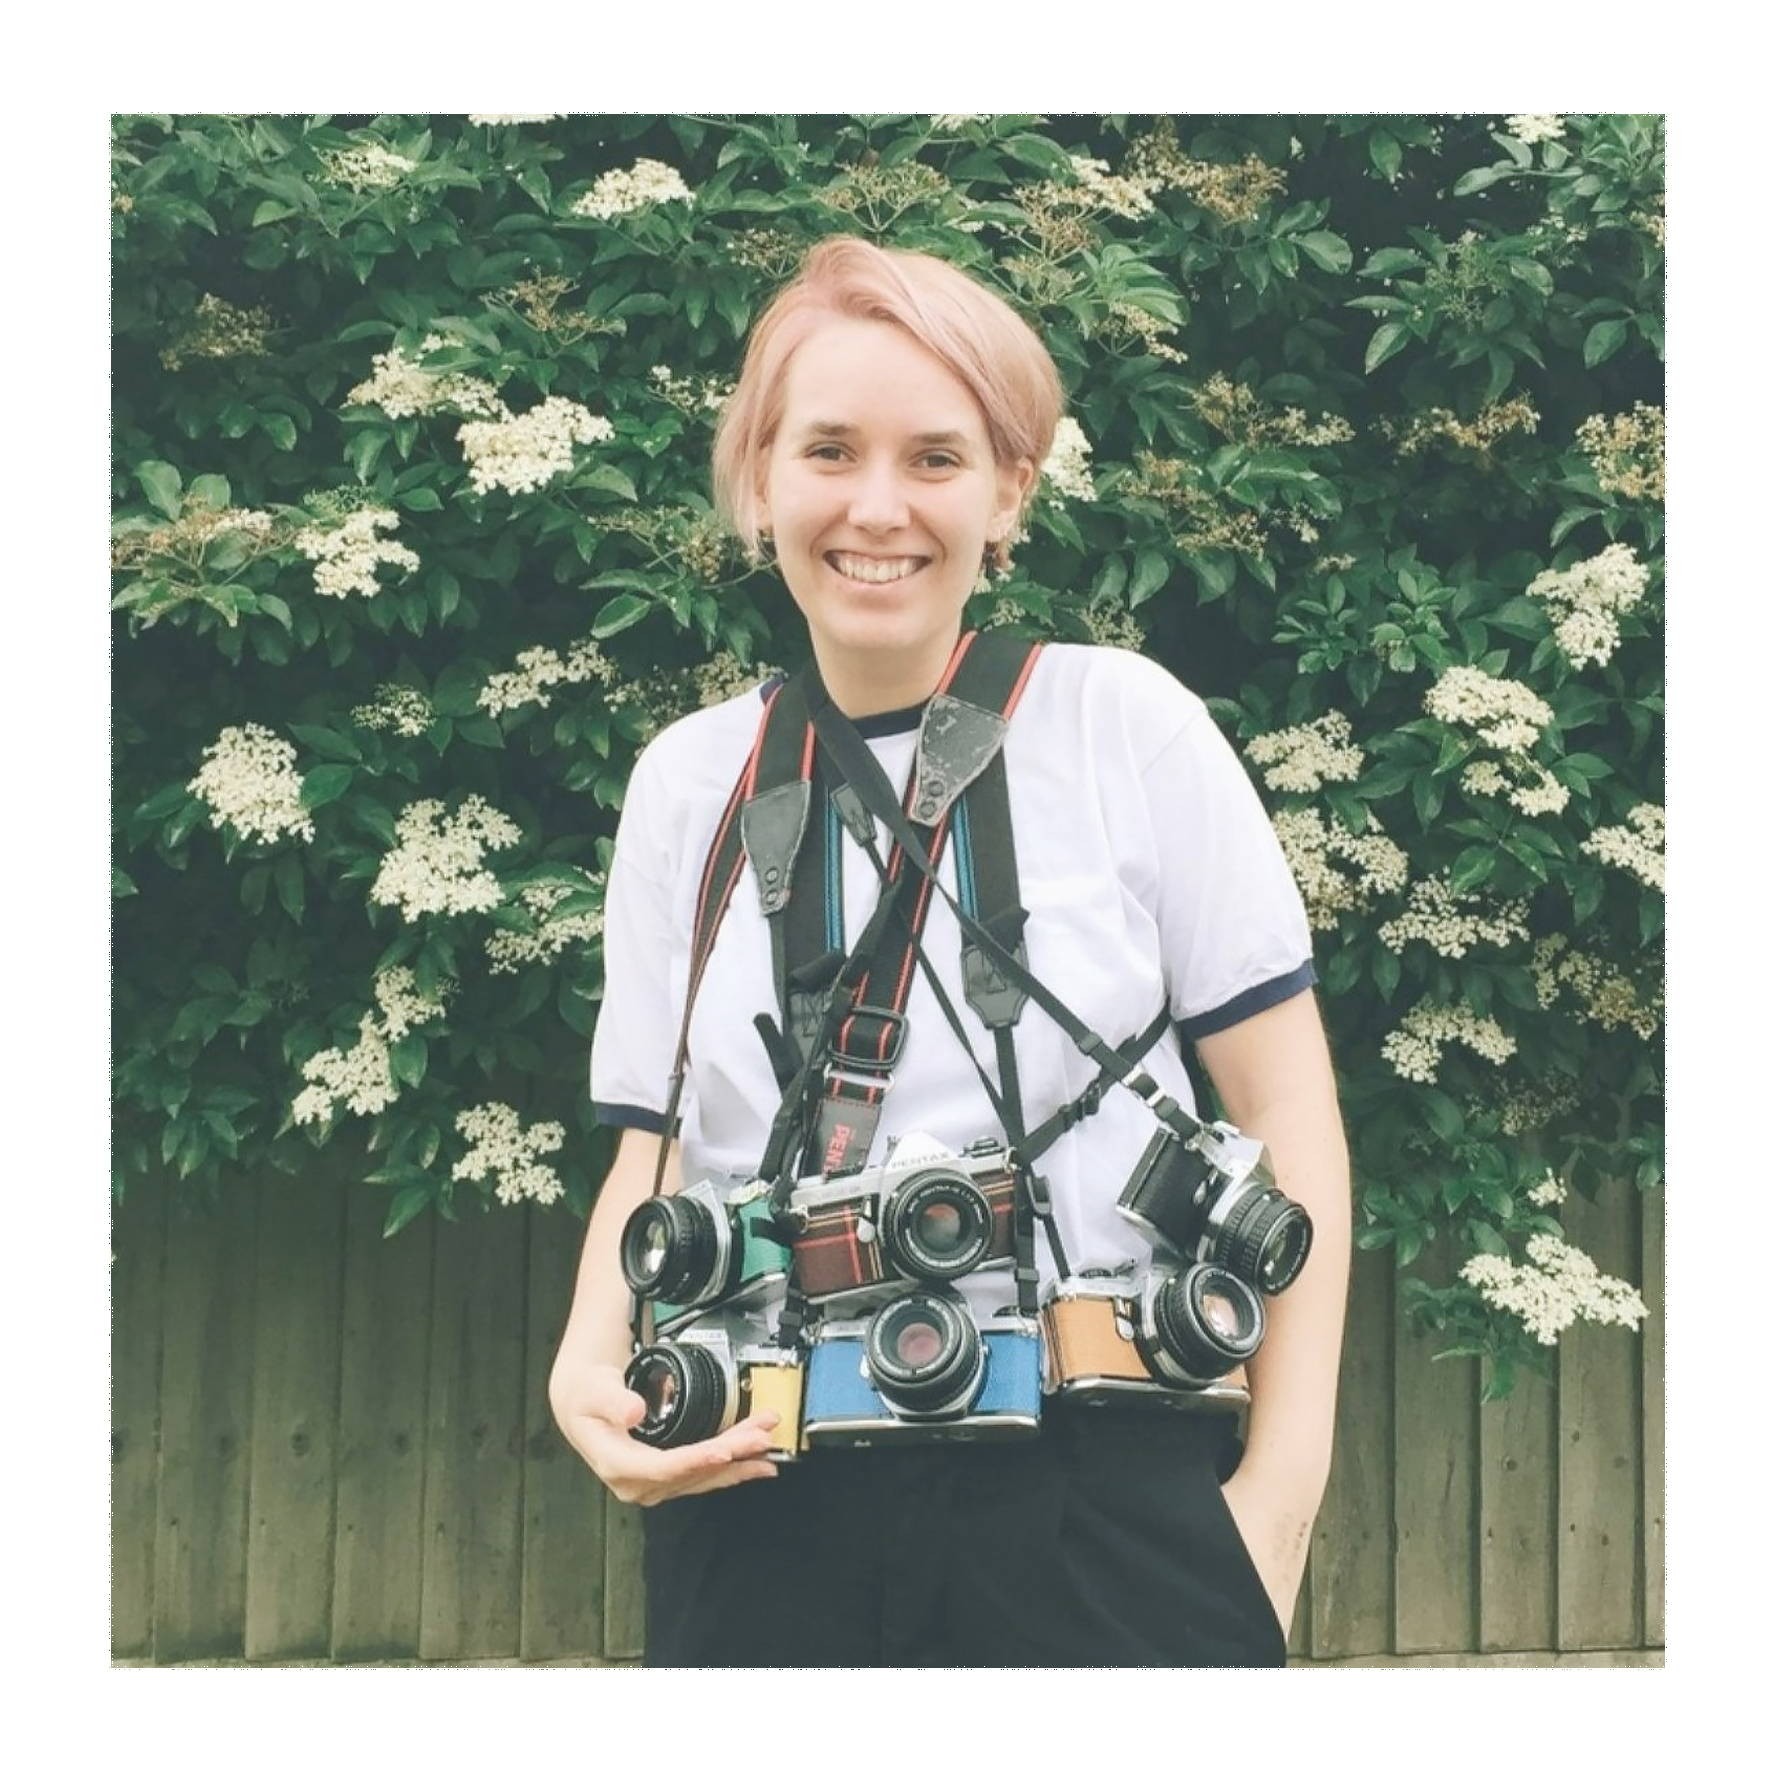 Marina Llopis   Ifwefilm   Analogue Wonderland